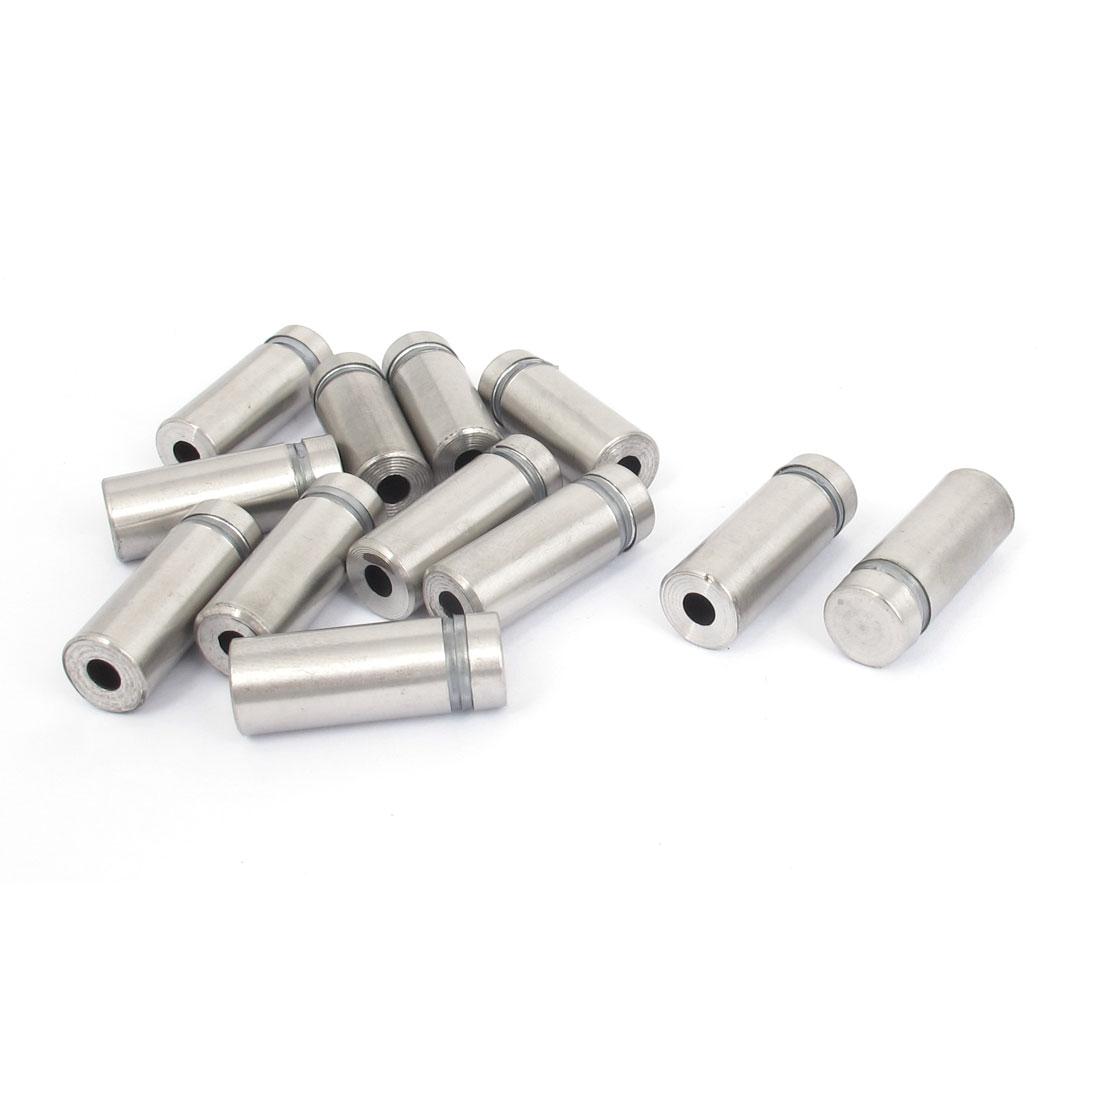 12mm x 30mm Stainless Steel Advertising Frameless Glass Standoff Pins 12pcs